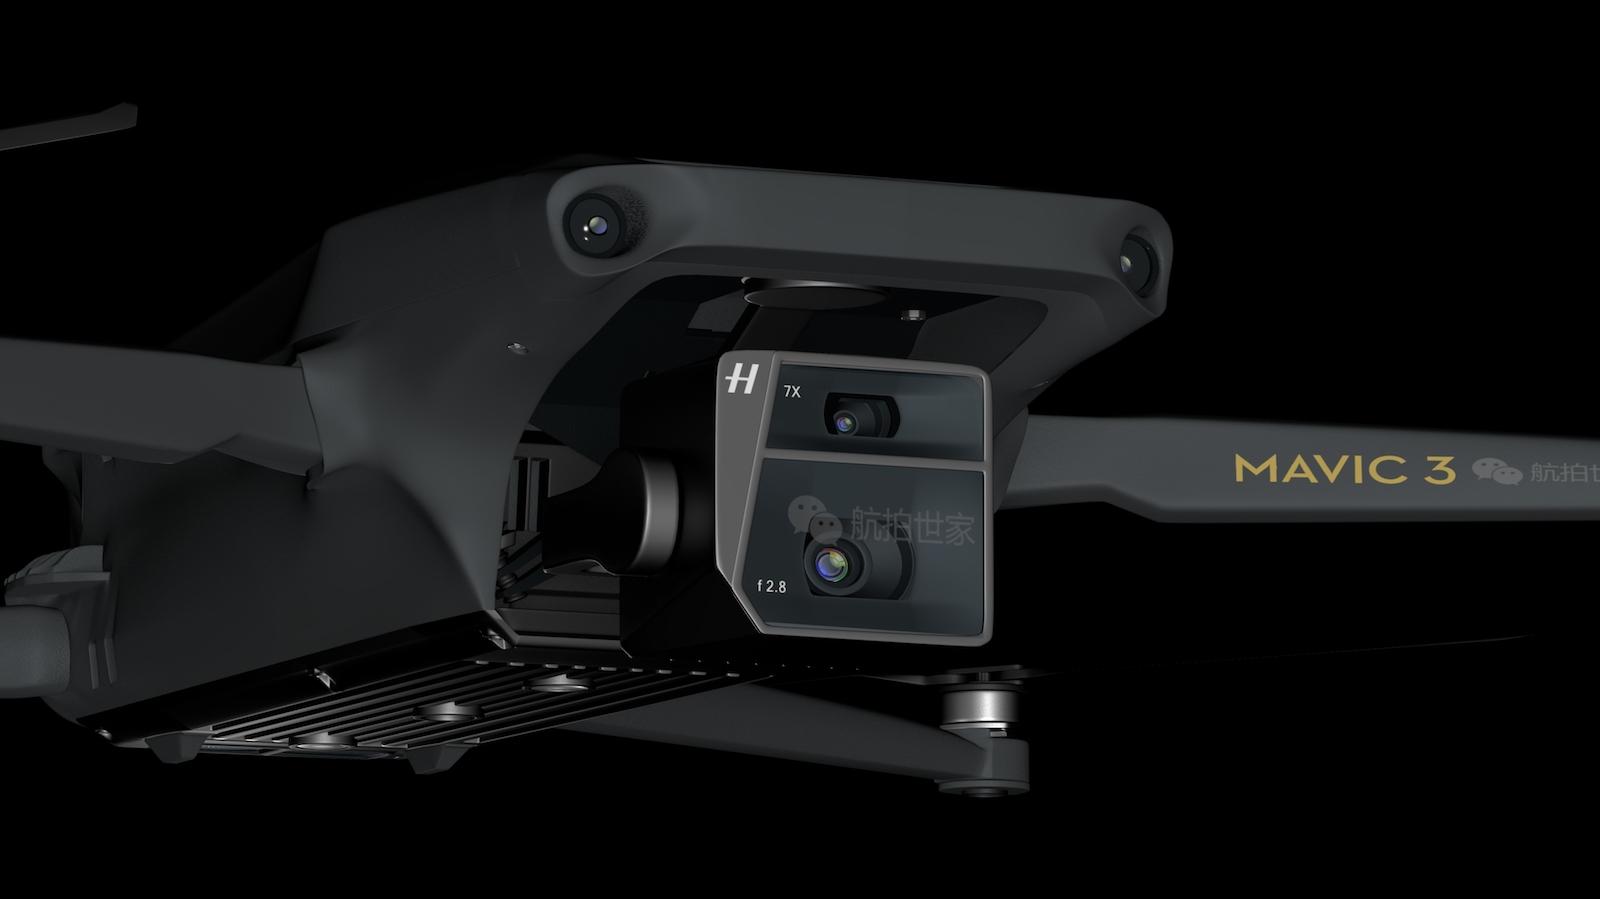 Камеры квадрокоптера